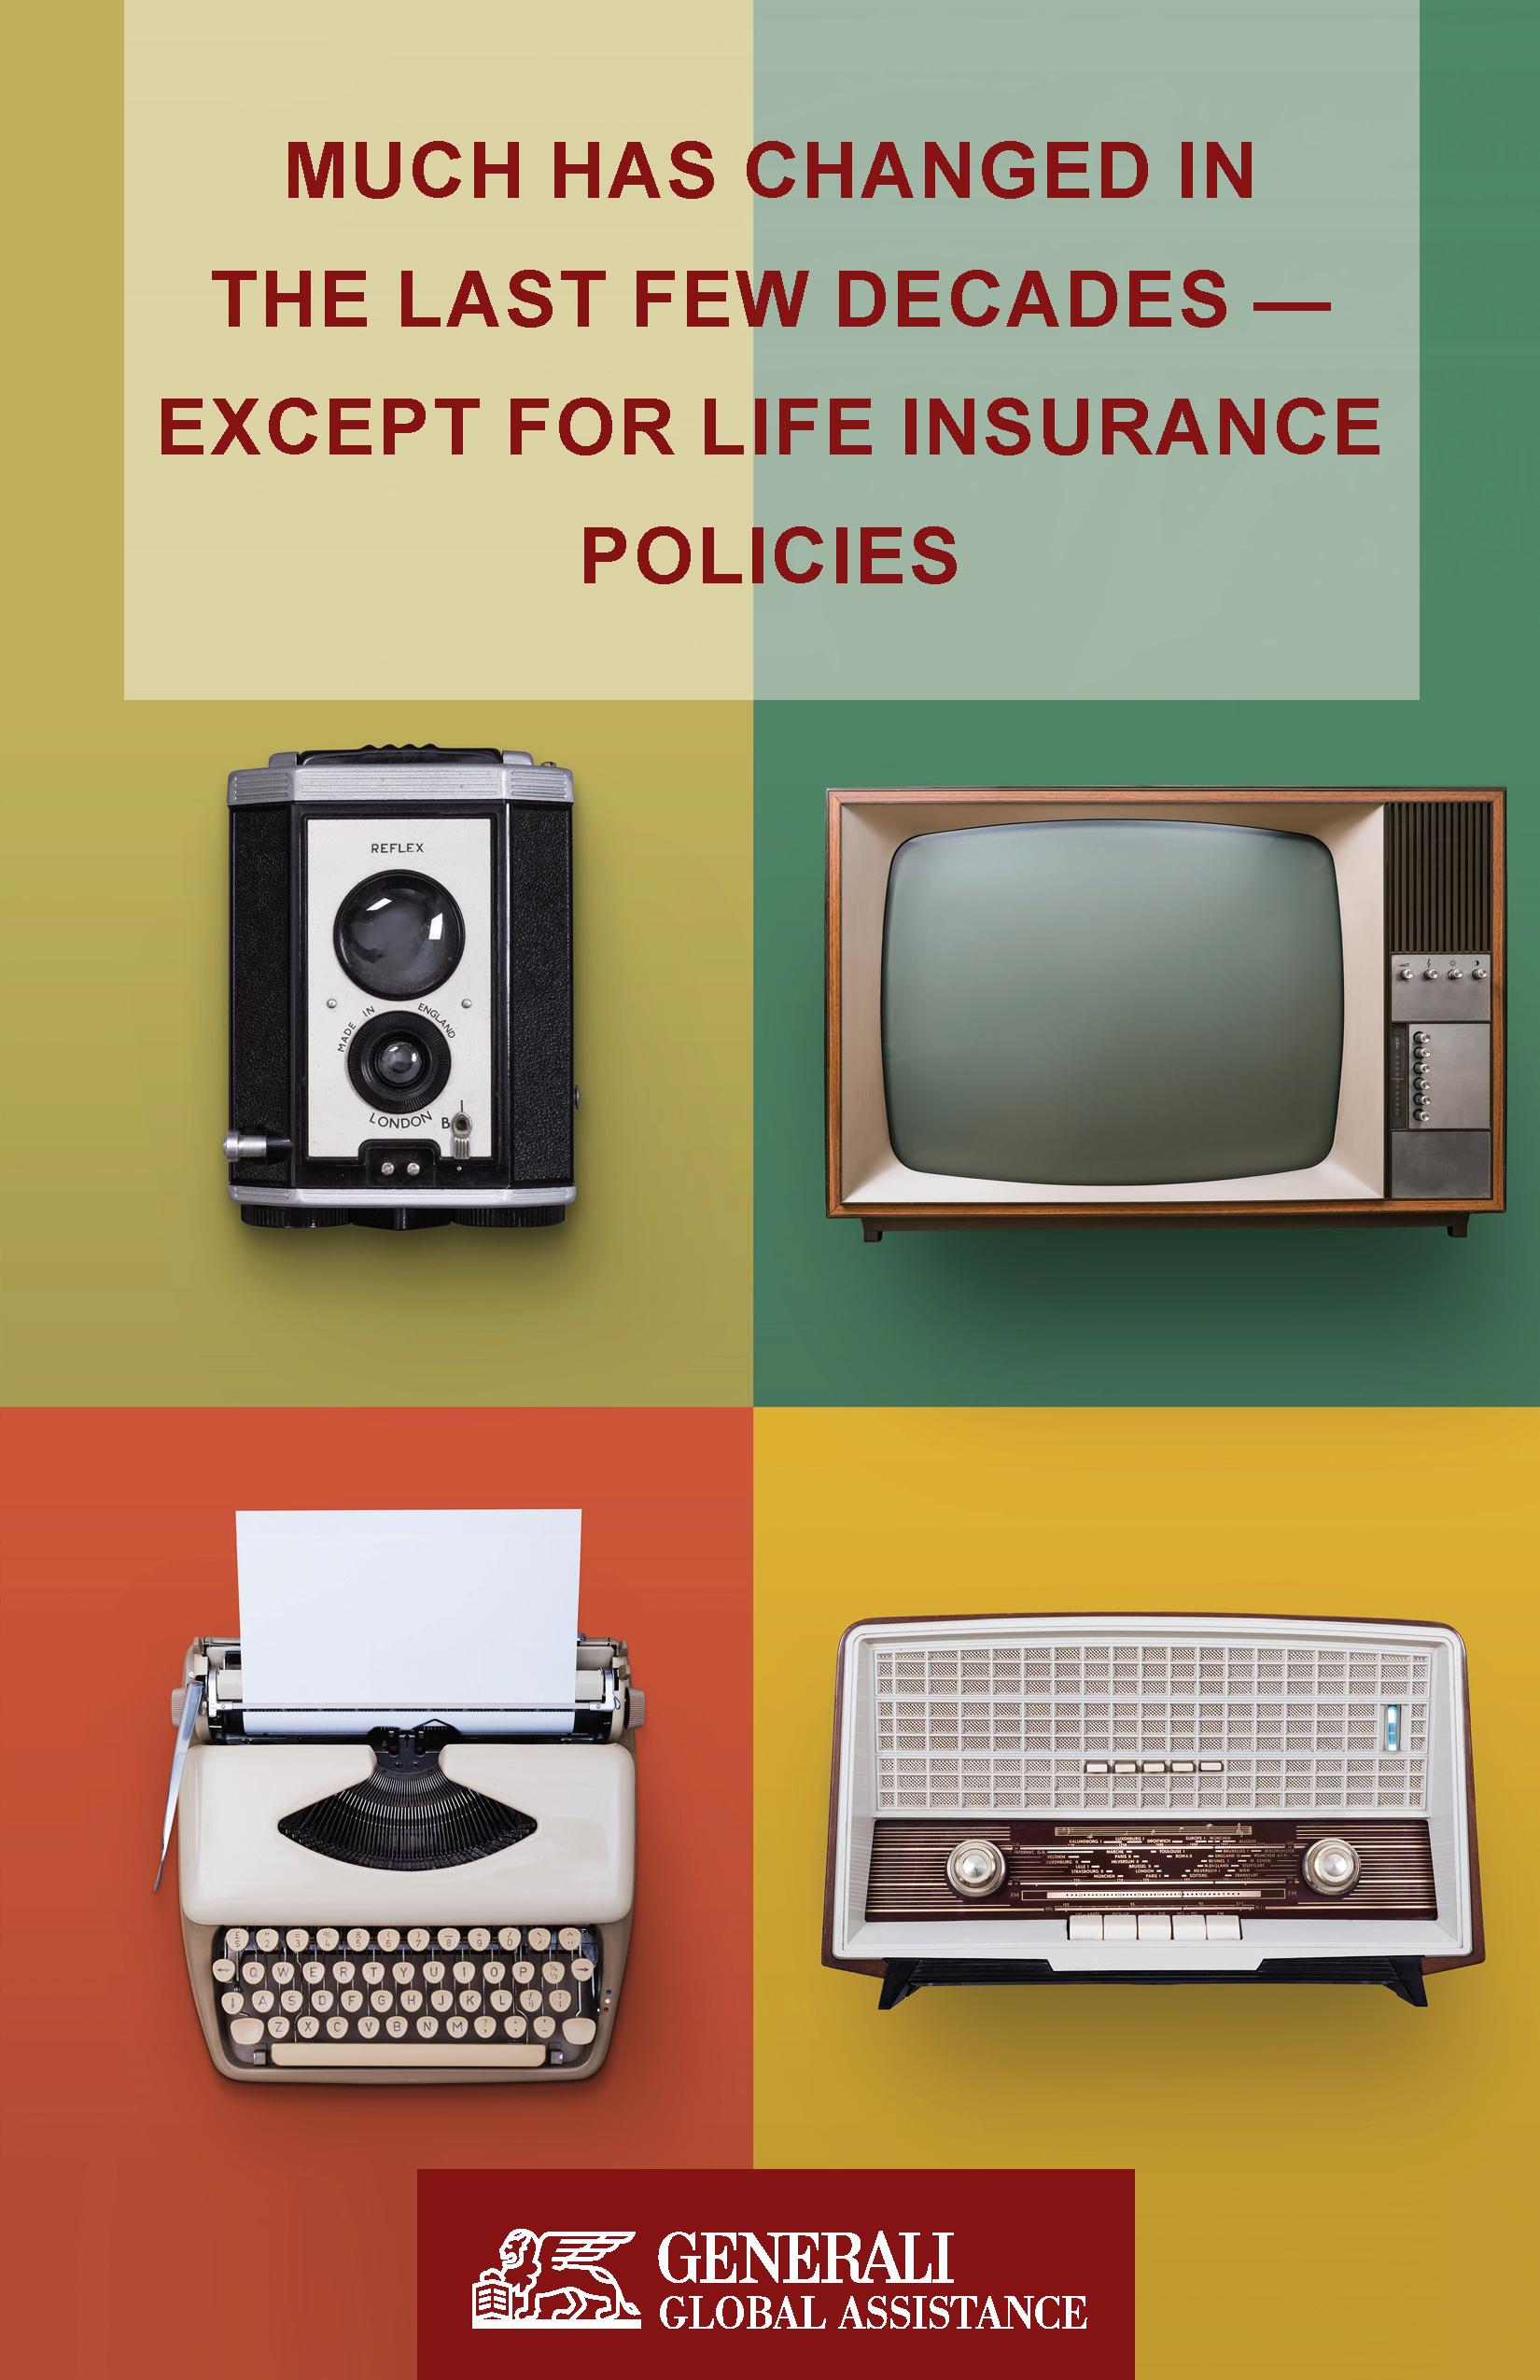 Life Insurance white paper